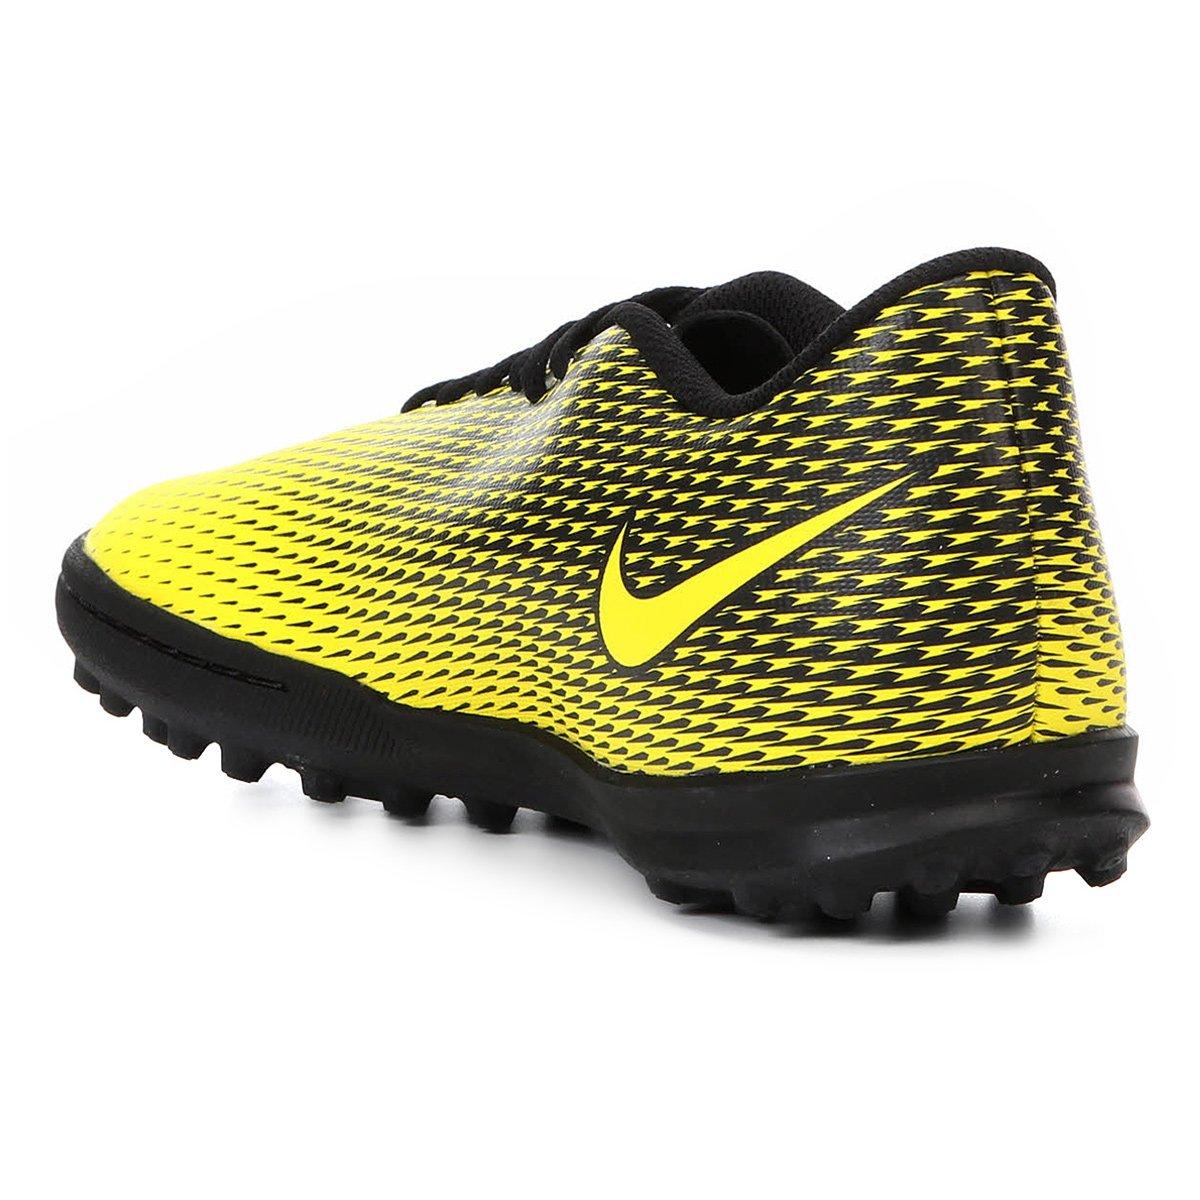 Chuteira Society Nike Bravata II TF - Amarelo e Preto - Compre Agora ... 4d19821b77b17